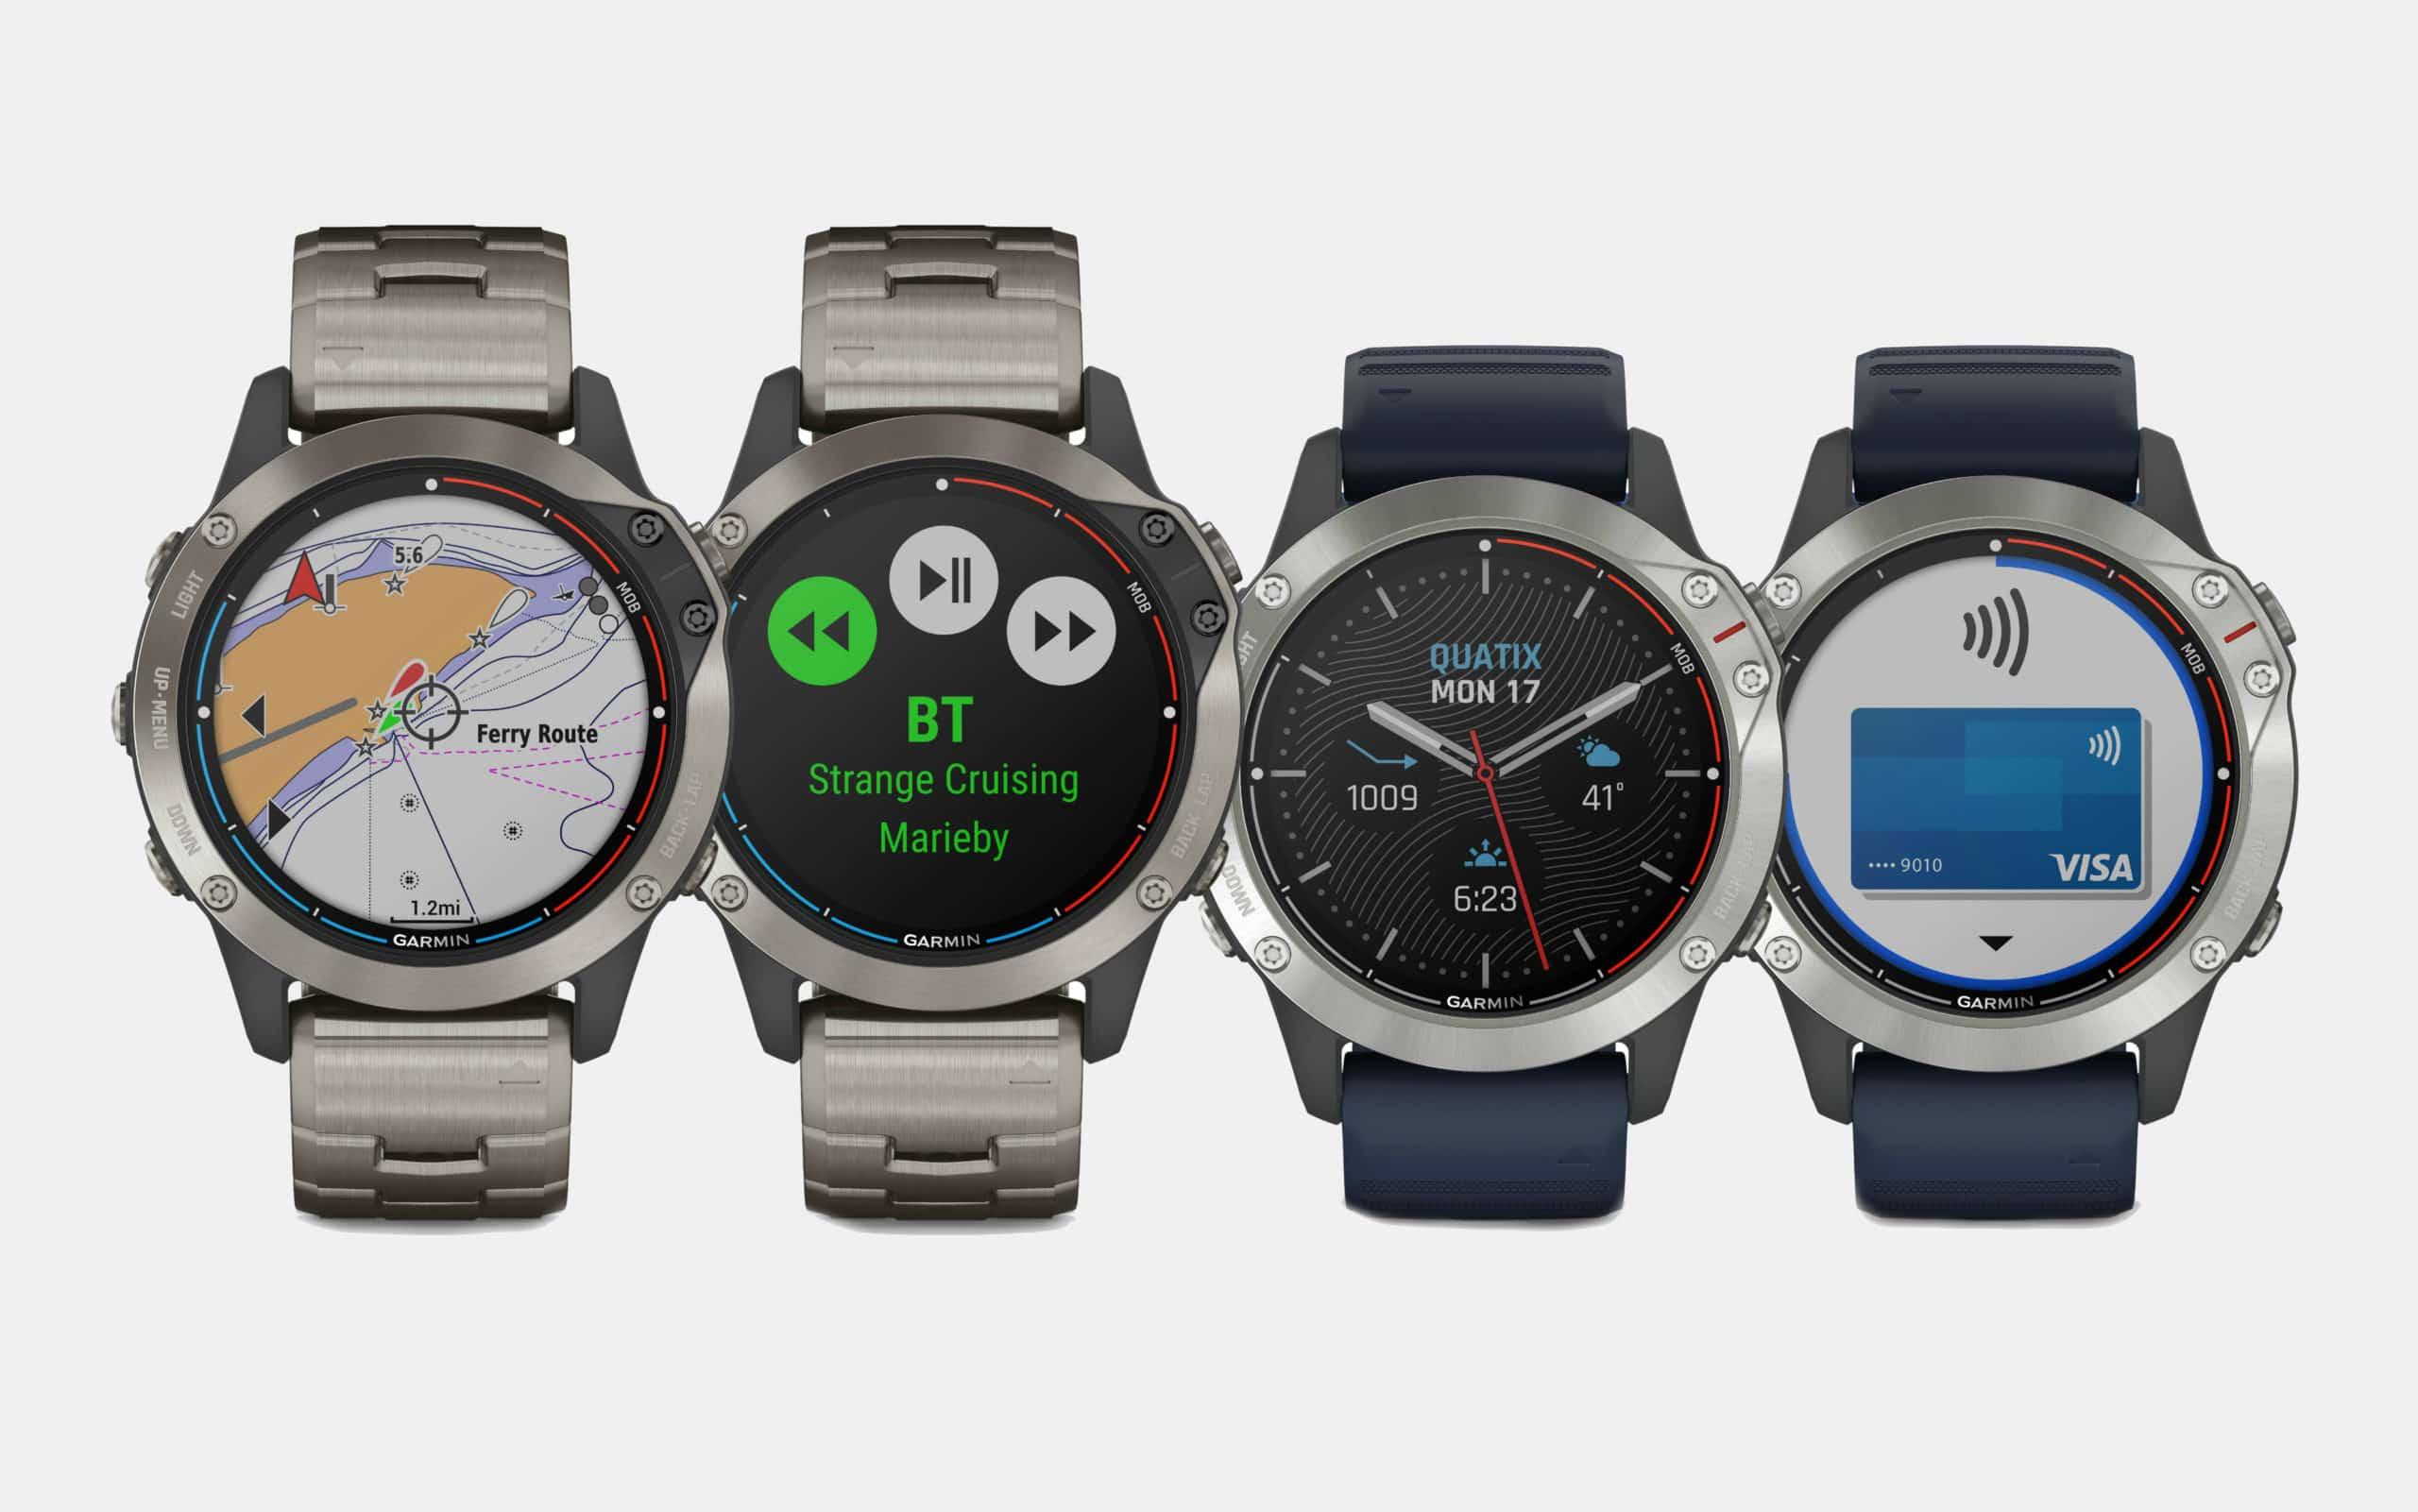 Garmin Quatix 6 Marine GPS Smartwatches